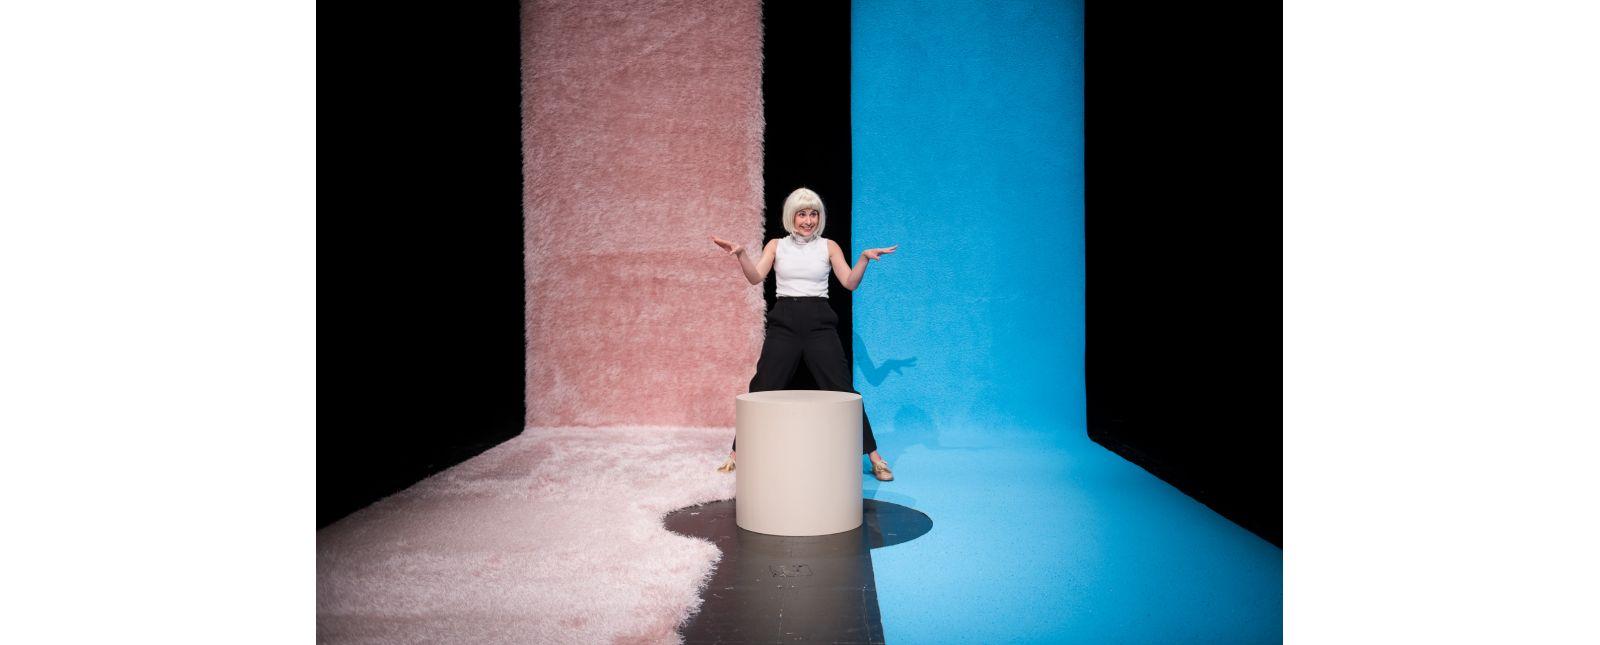 Girls & Boys // Angela Falkenhan // 2018 // Marc Doradzillo